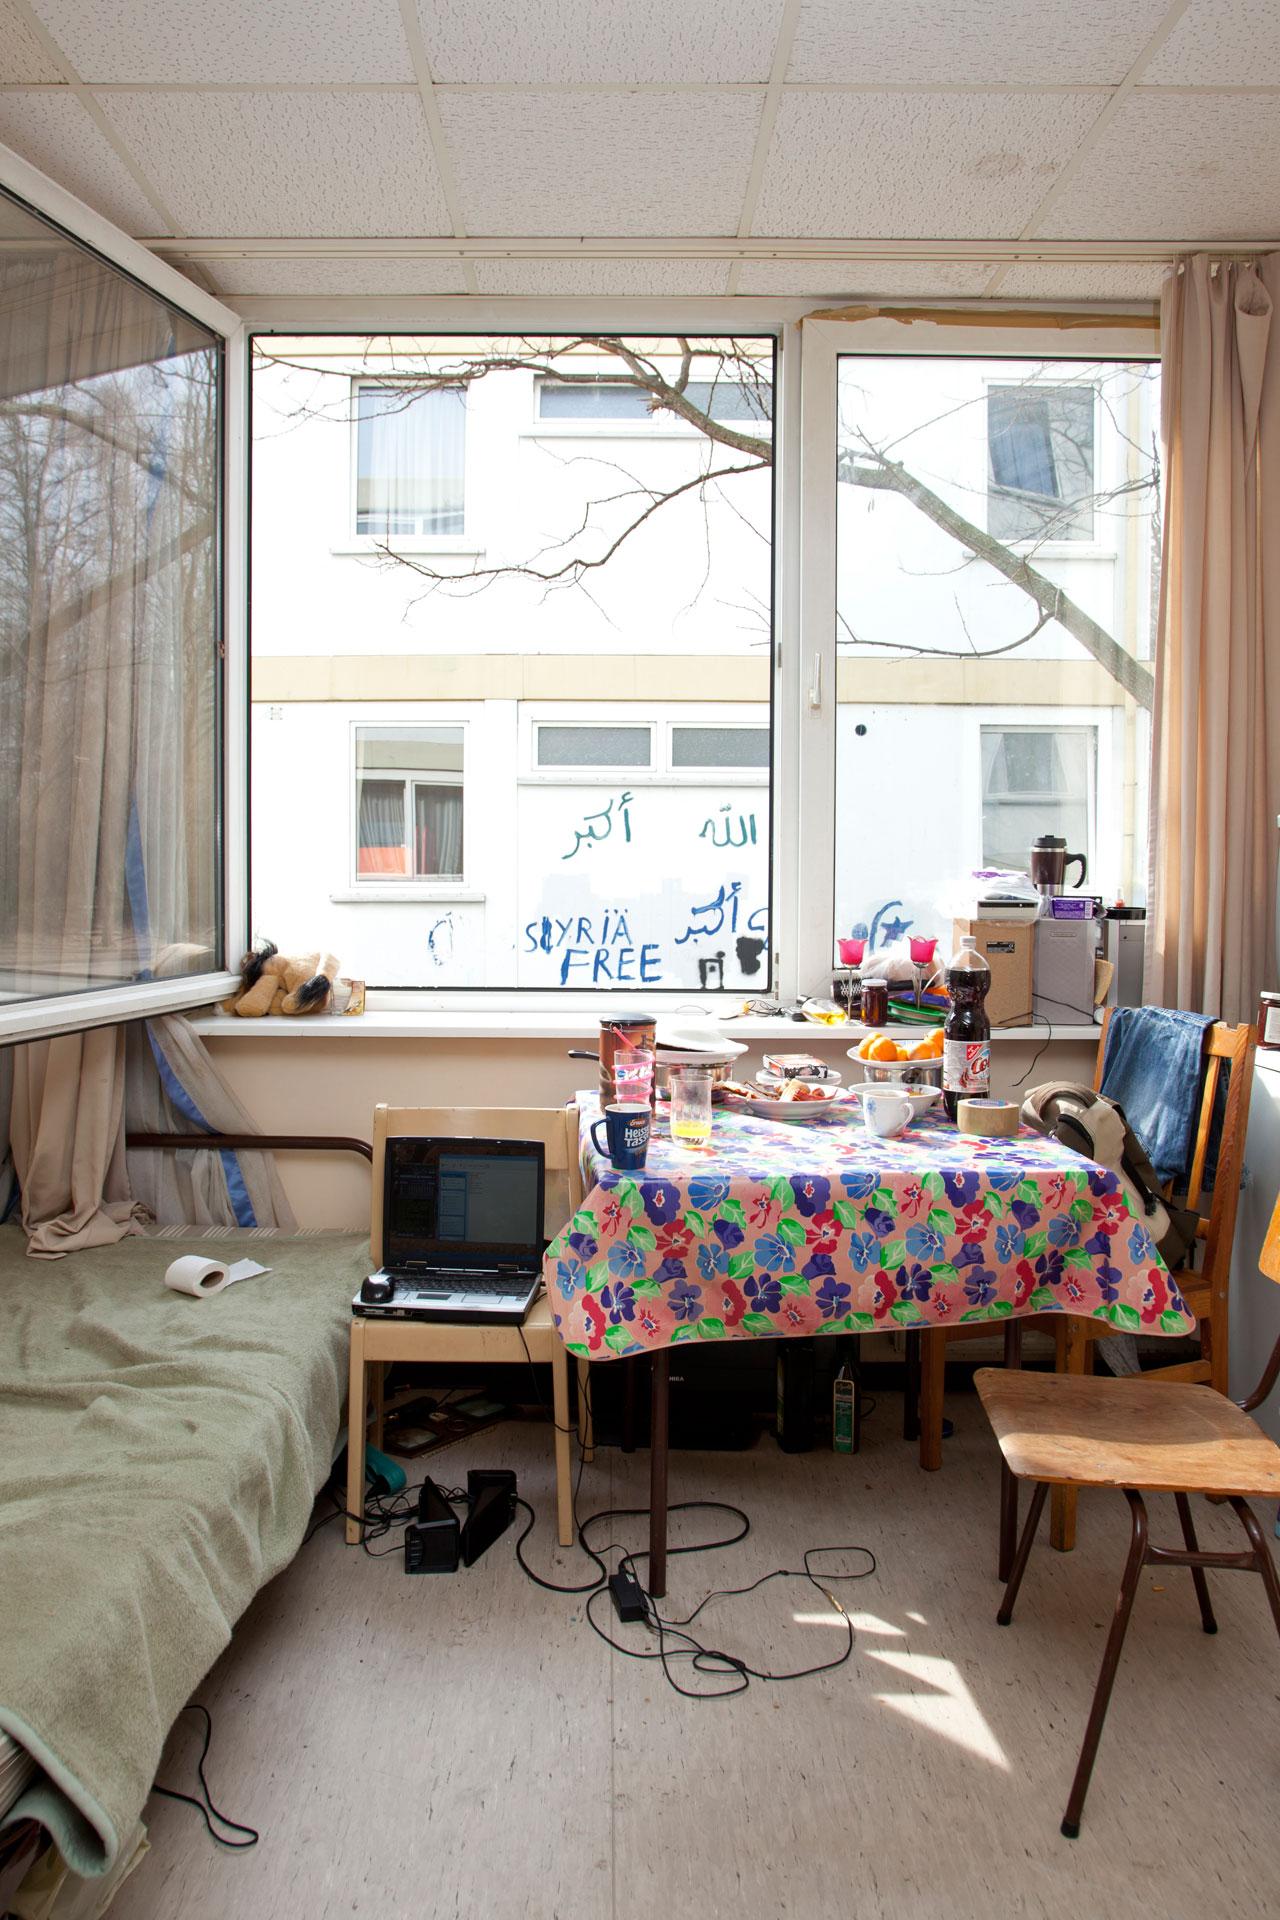 Silke Schwarz - 17 qm - Warten auf Heimat - Felix Schoeller Photoaward